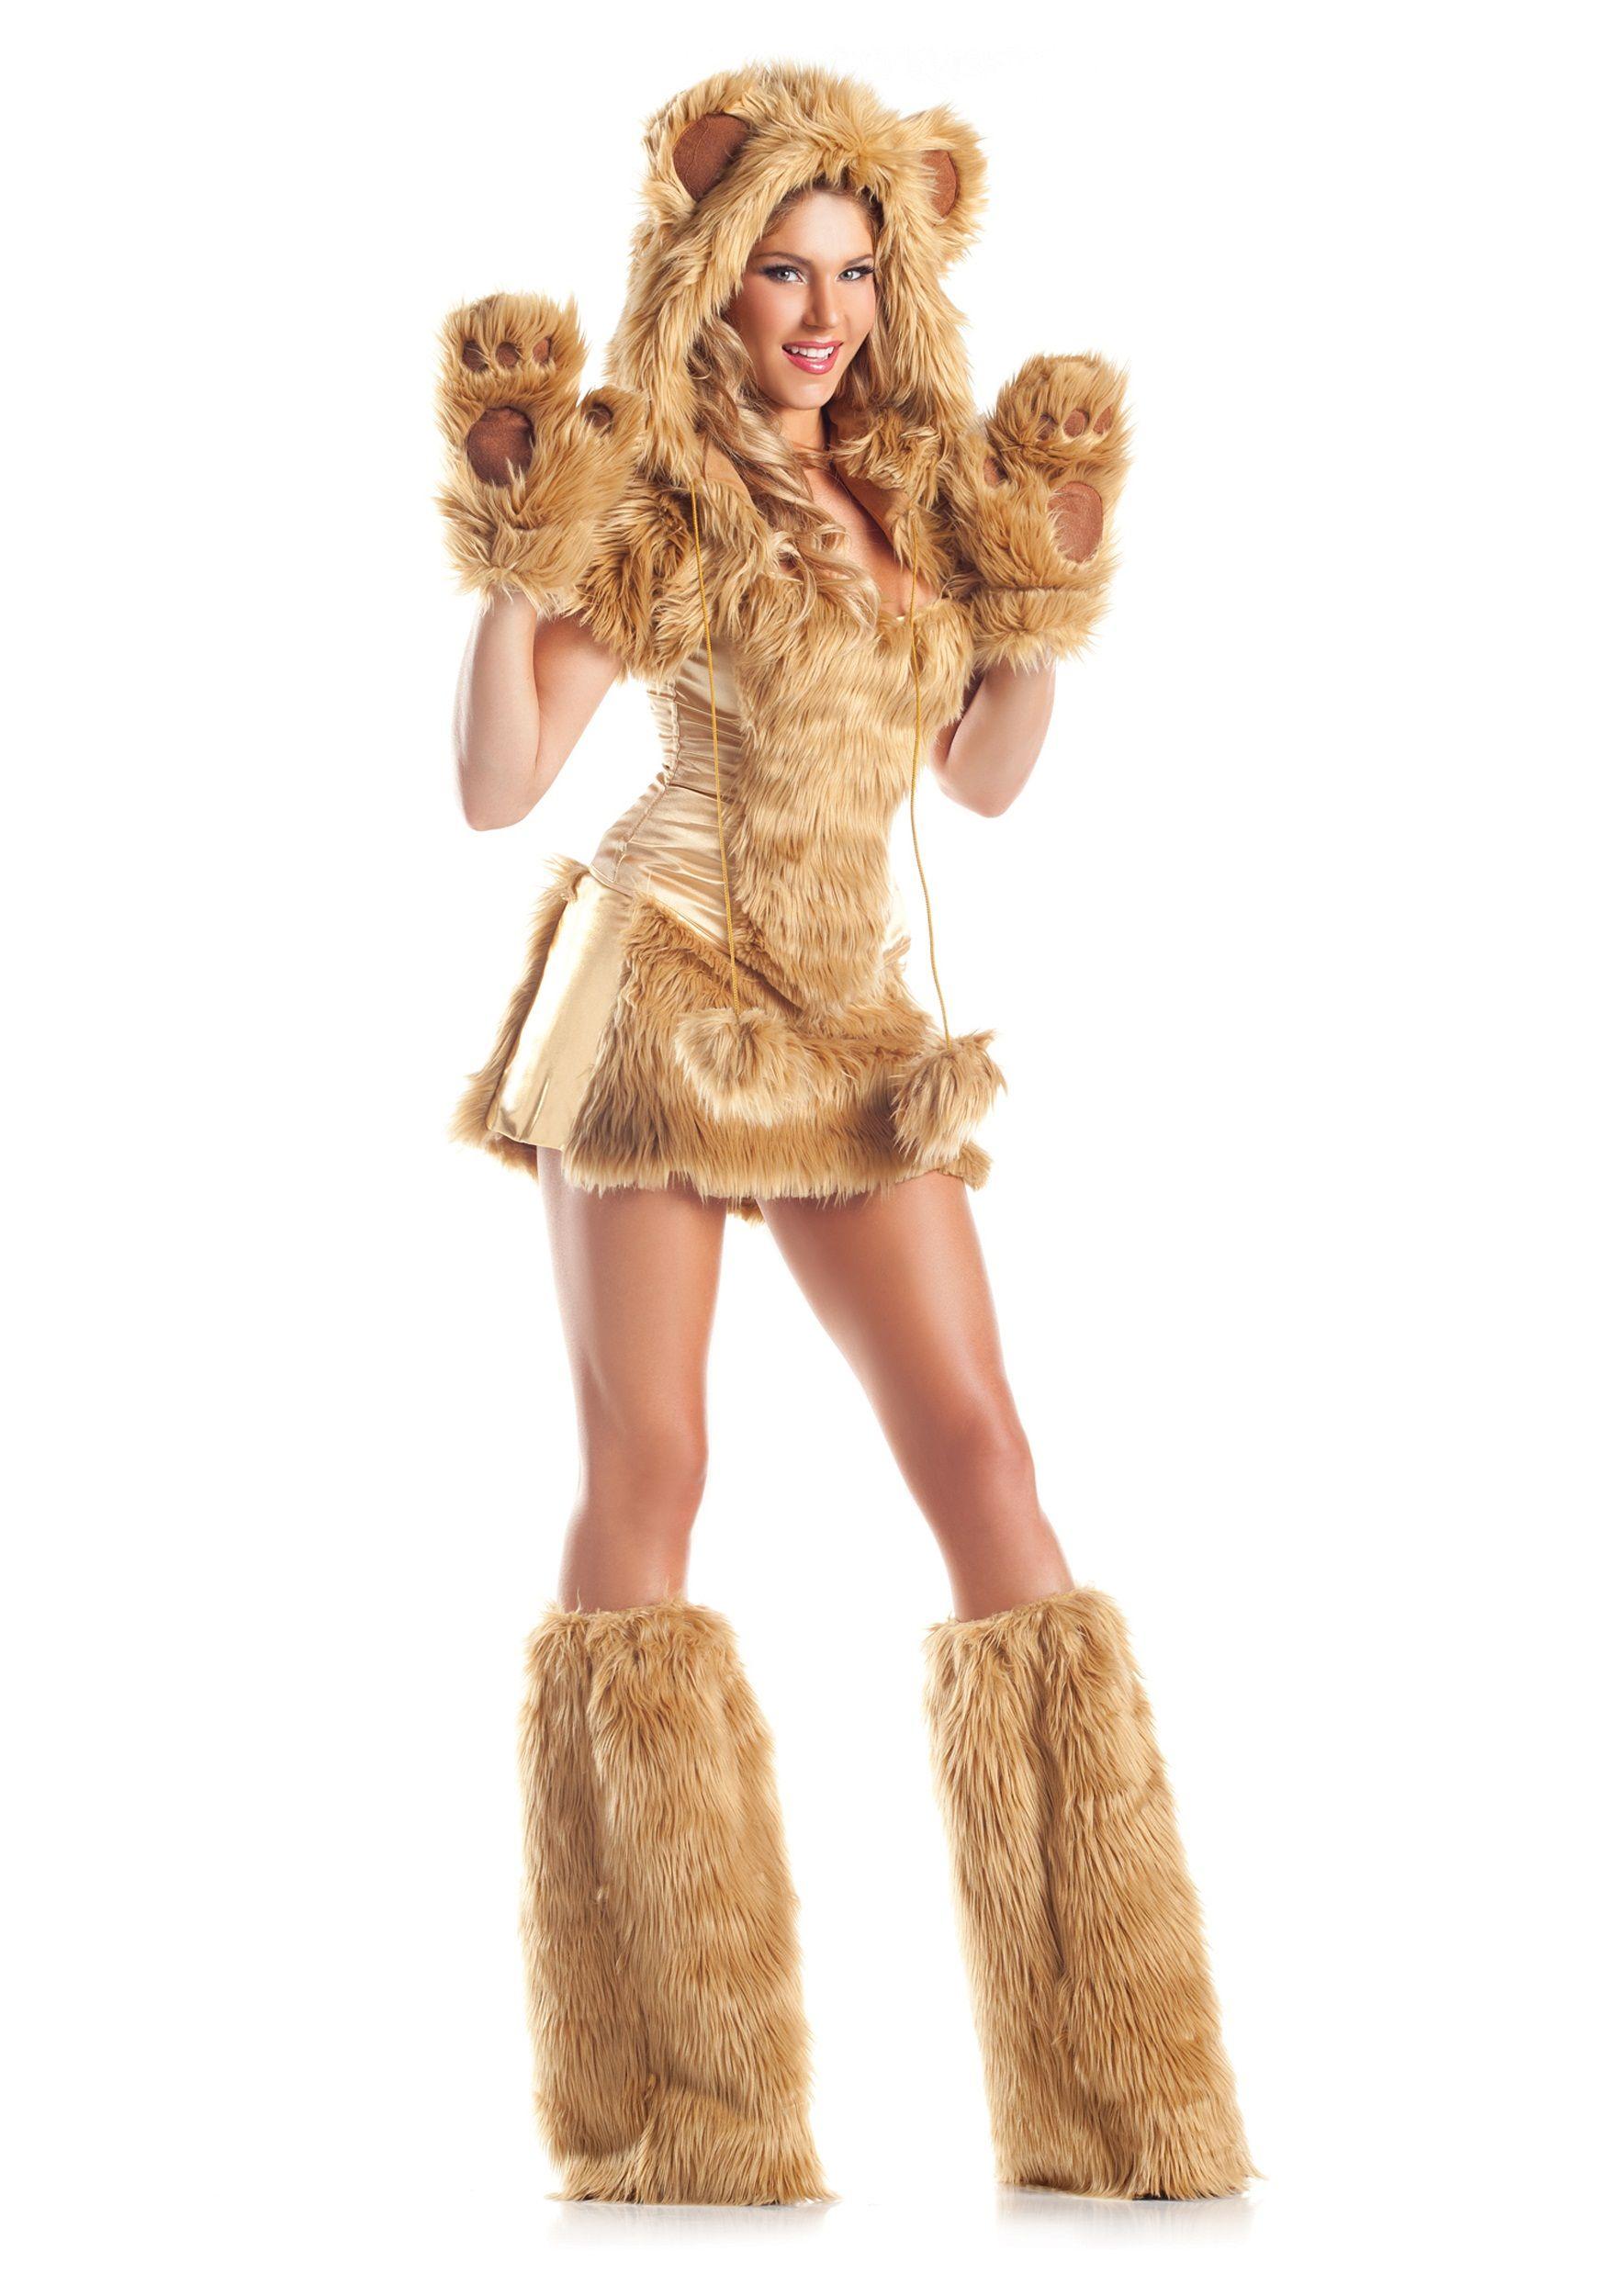 Adult halloween costumes bear big, free pics of big fake tits